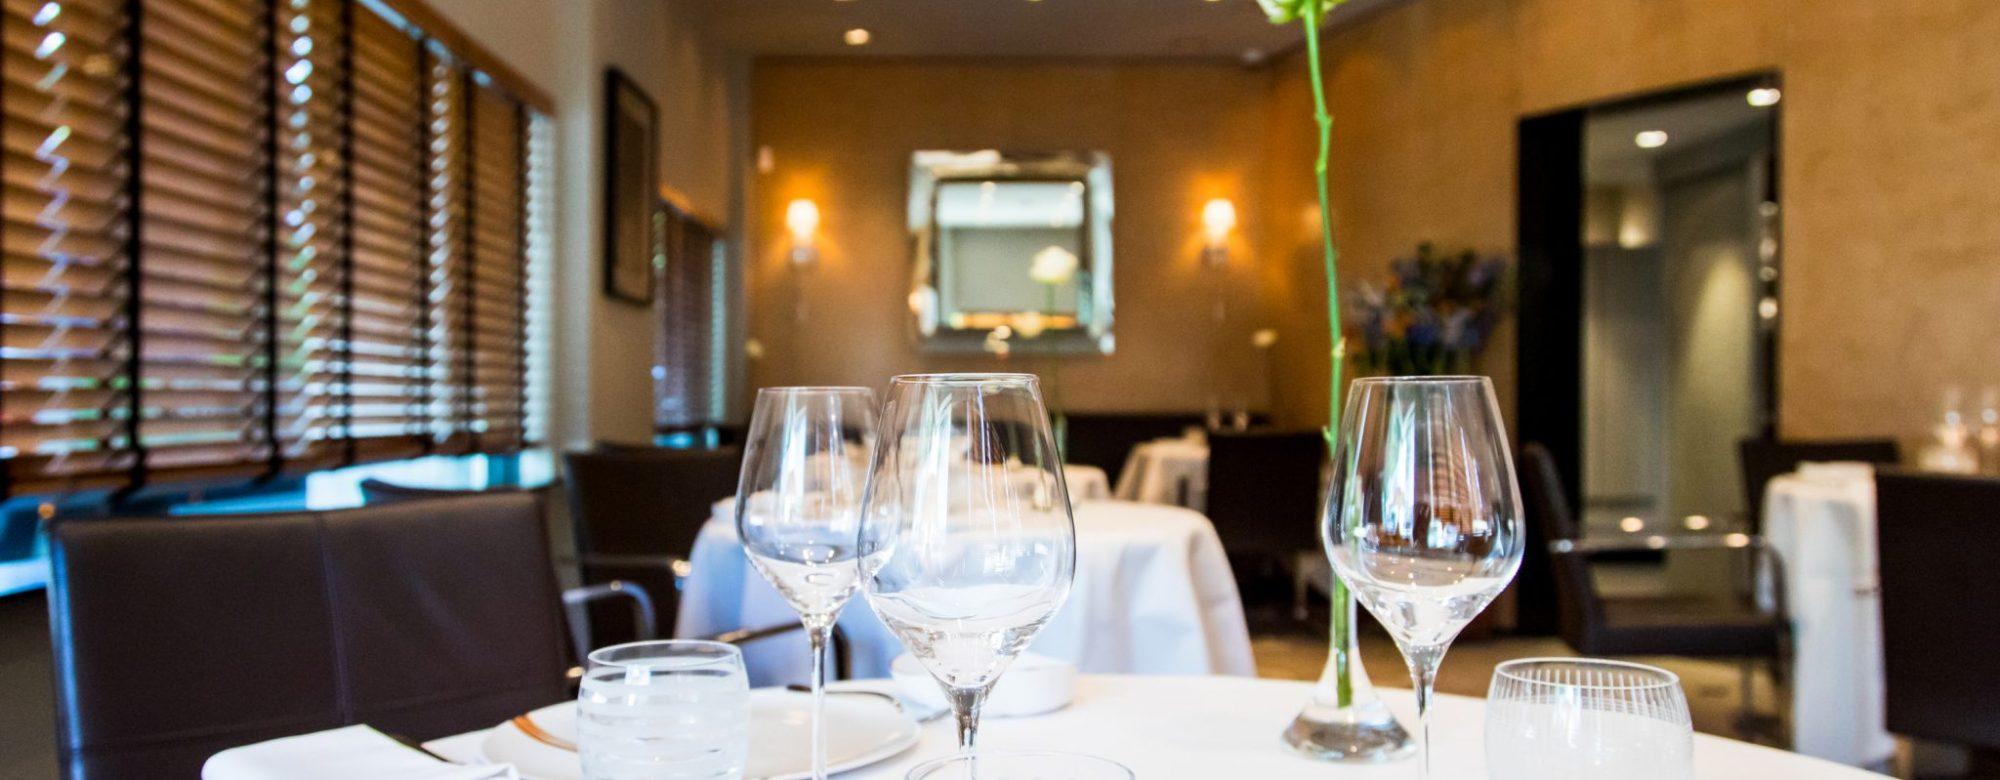 Le restaurant de Jean Luc Tartarin au Havre